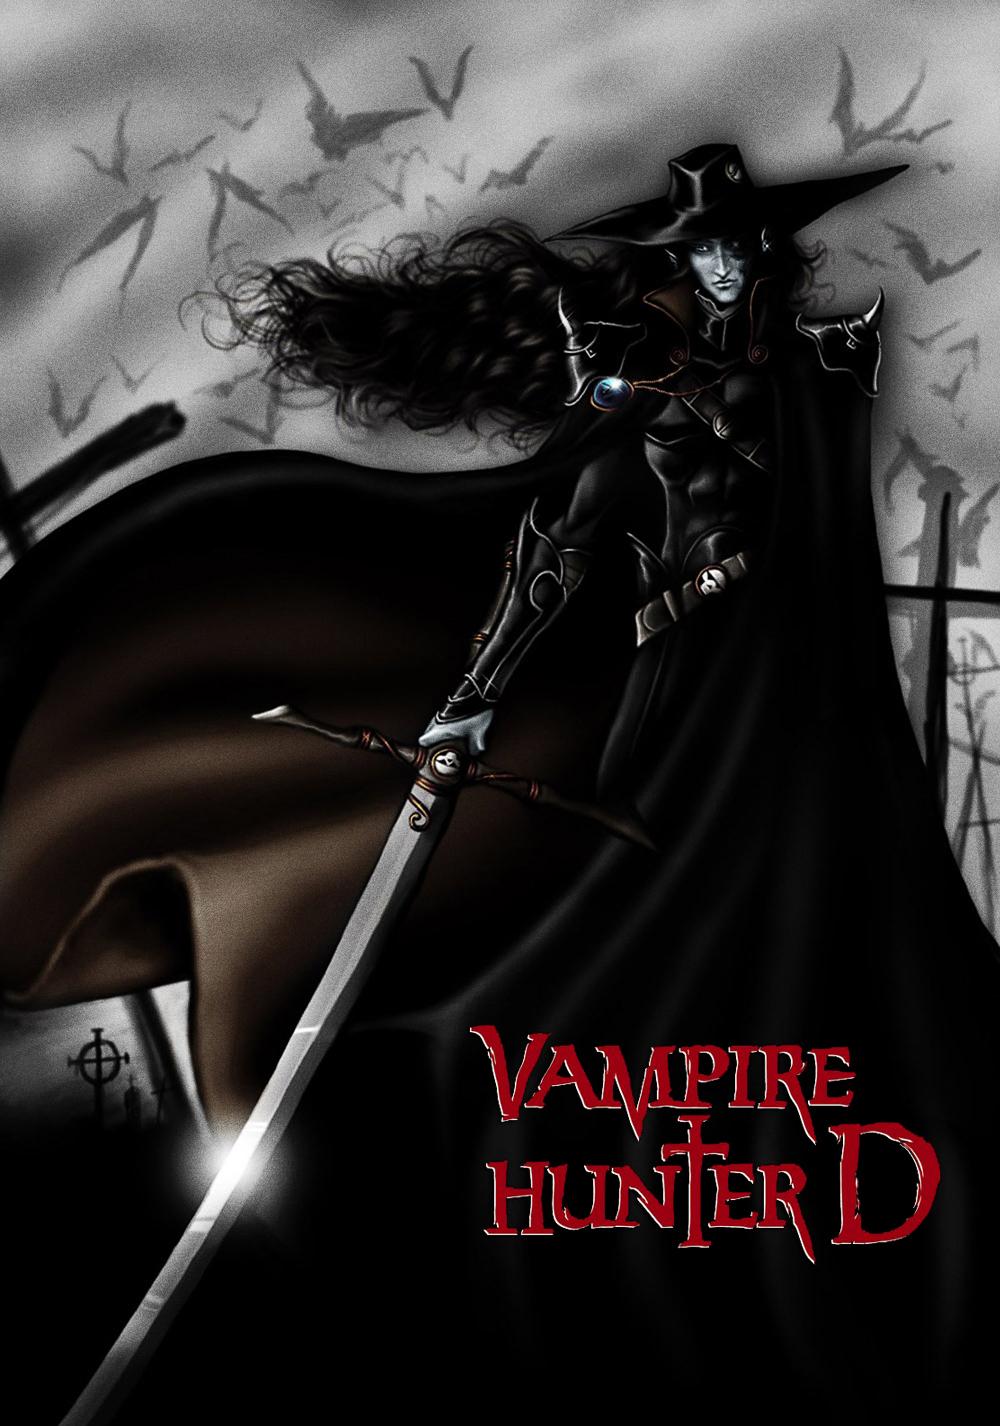 vampire hunter d anime movies